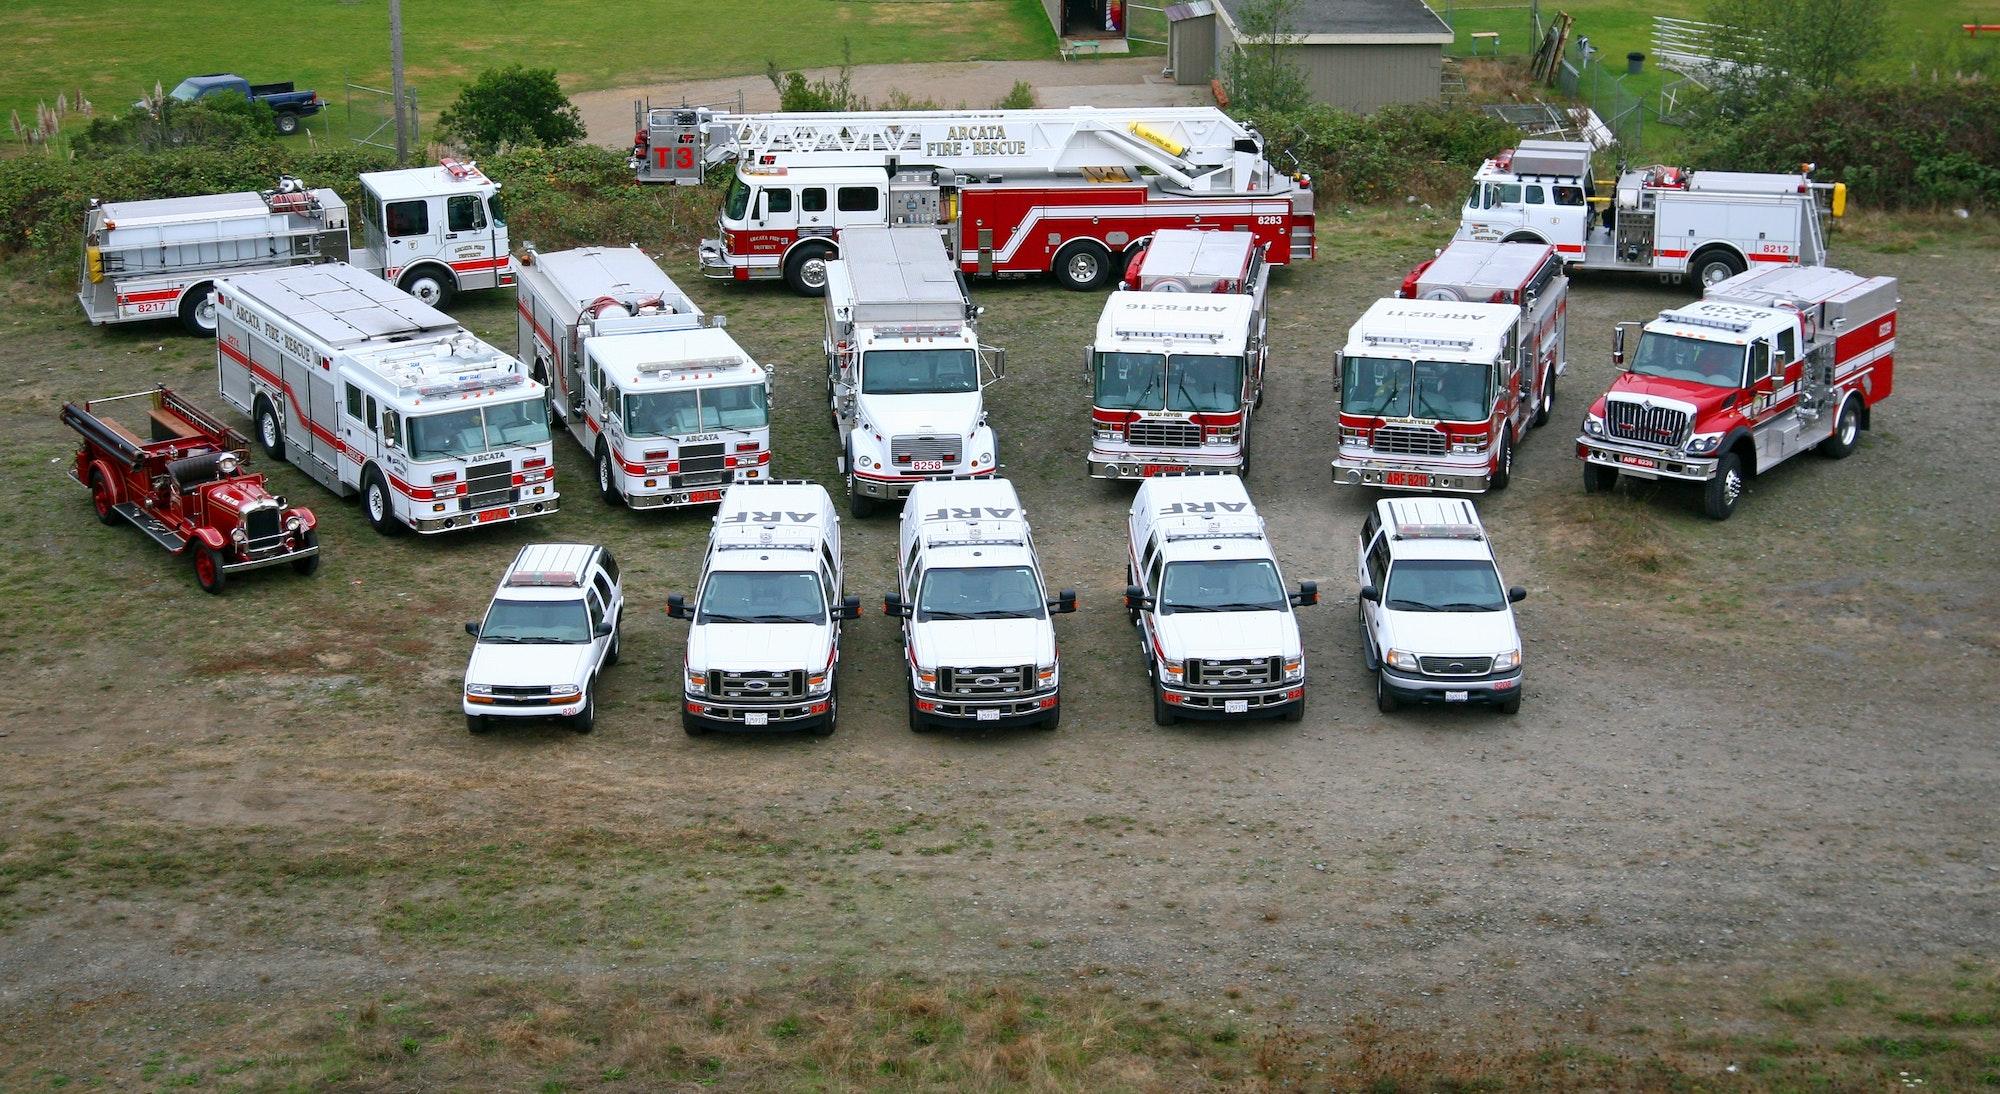 Image of fleet from 2008